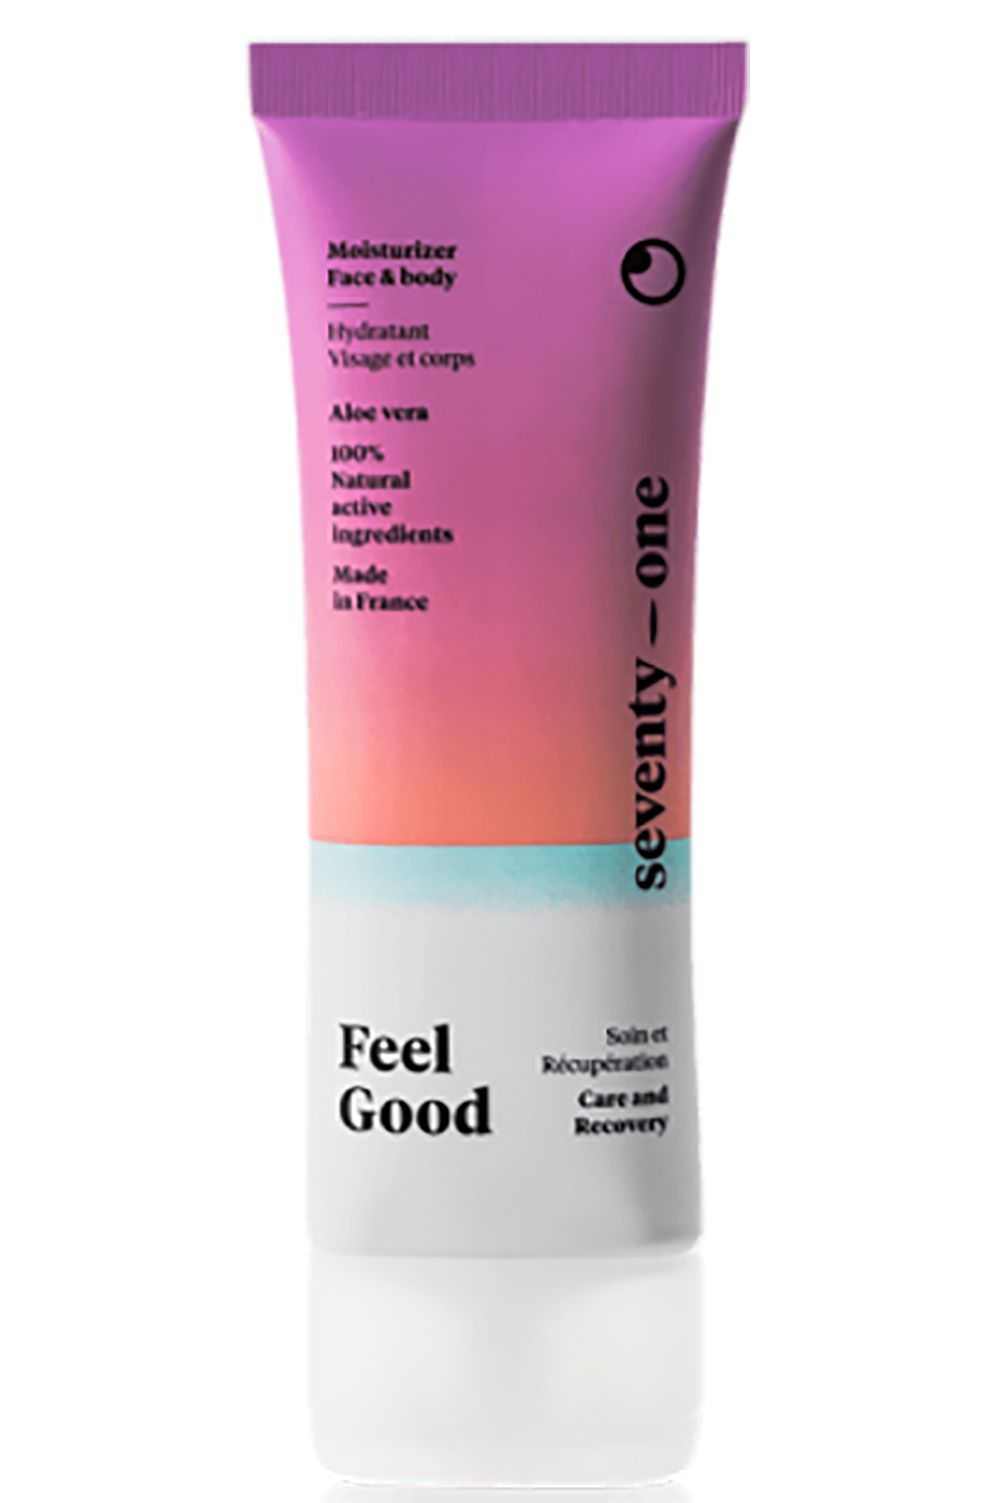 Seventy One Percent Sunscreen FELL GOOD MOISTURIZER Assorted